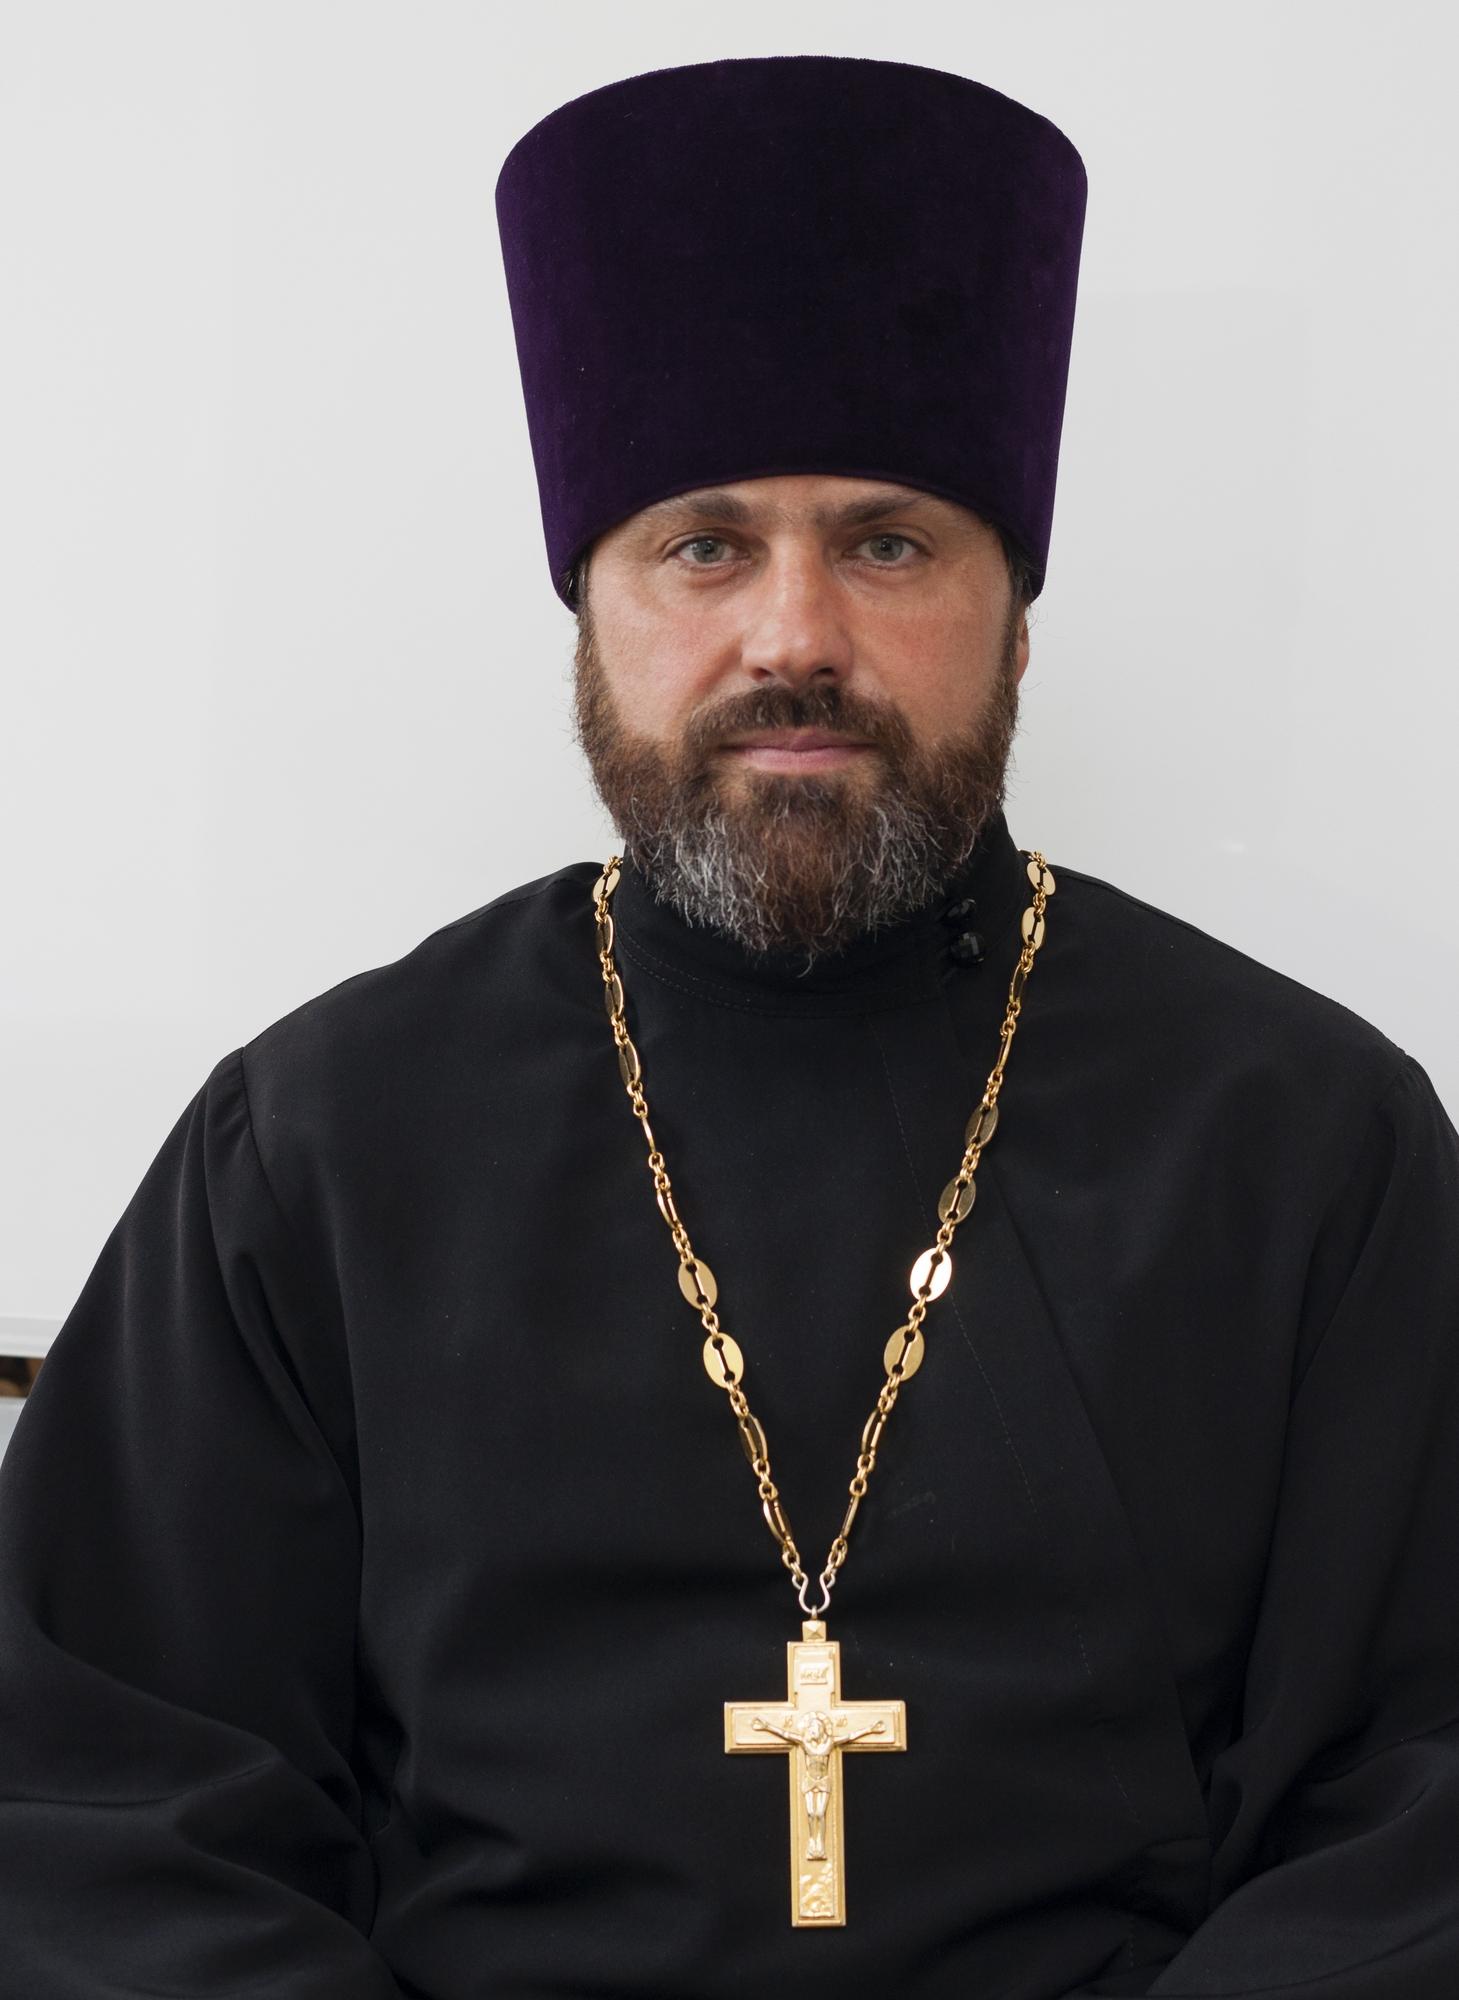 Протоиерей Димитрий Михайлович Измайлов